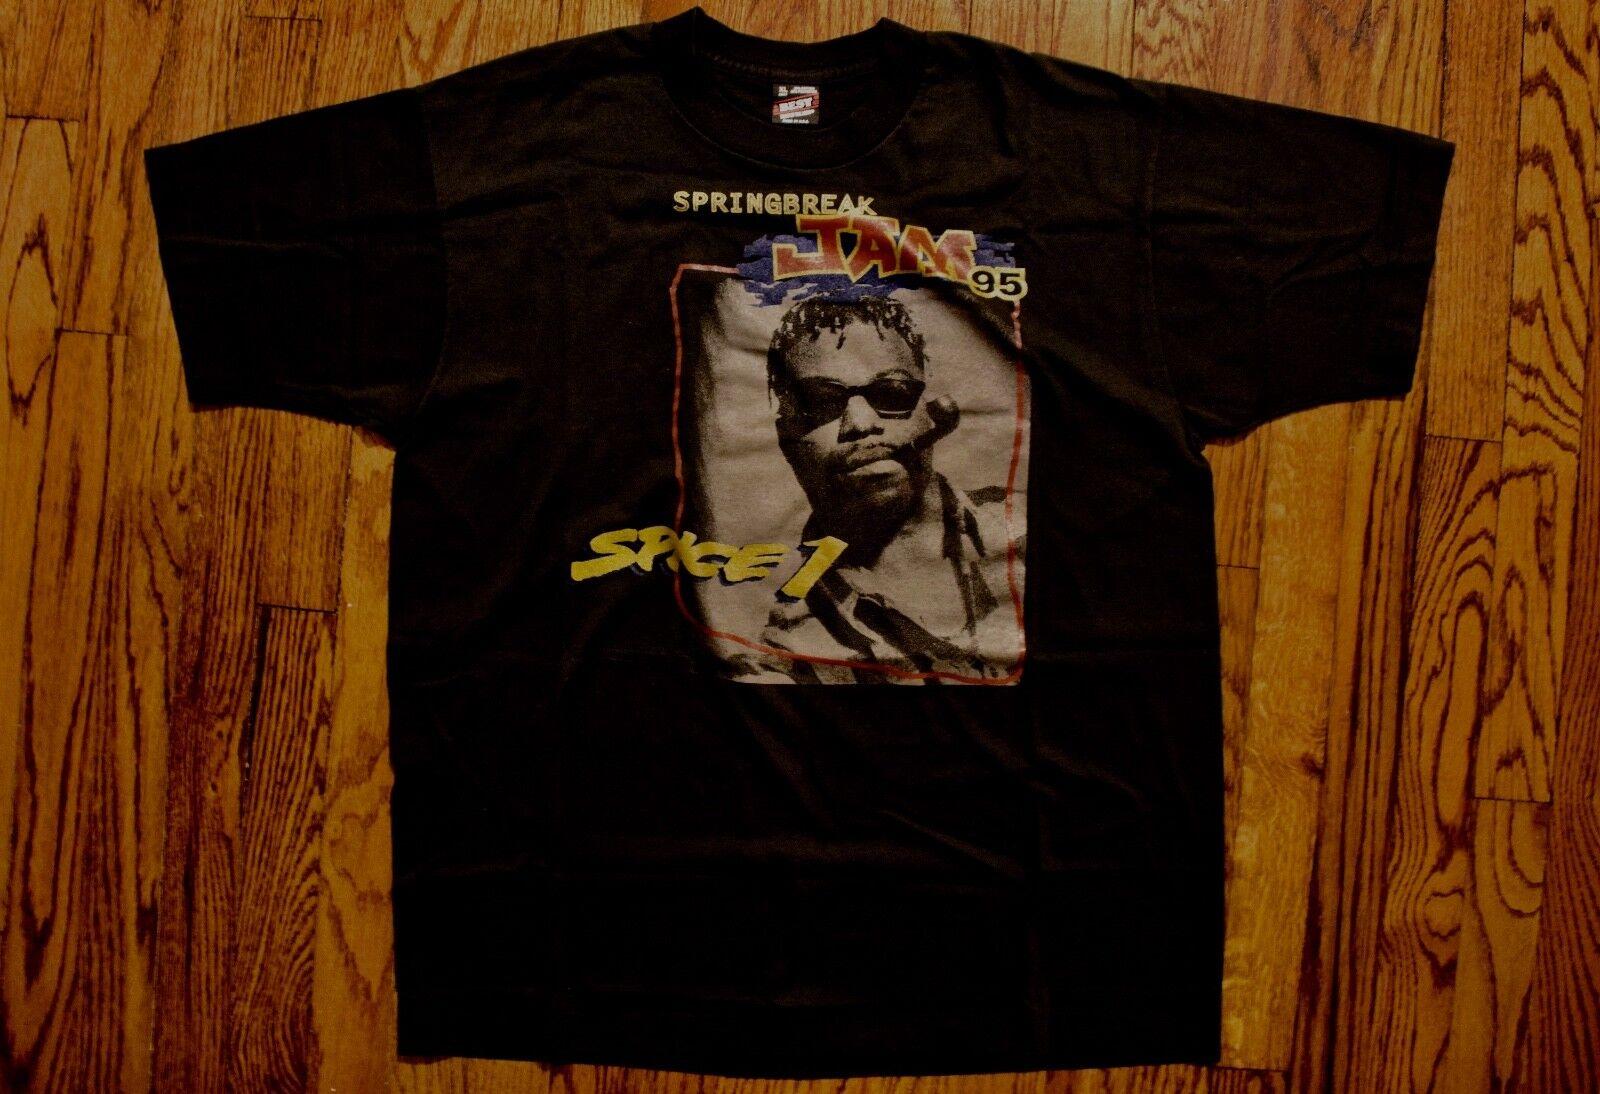 1995 Spice 1 Spring Break Amerikkka's nightmare T-shirt vtg 90s rap hip hop XL